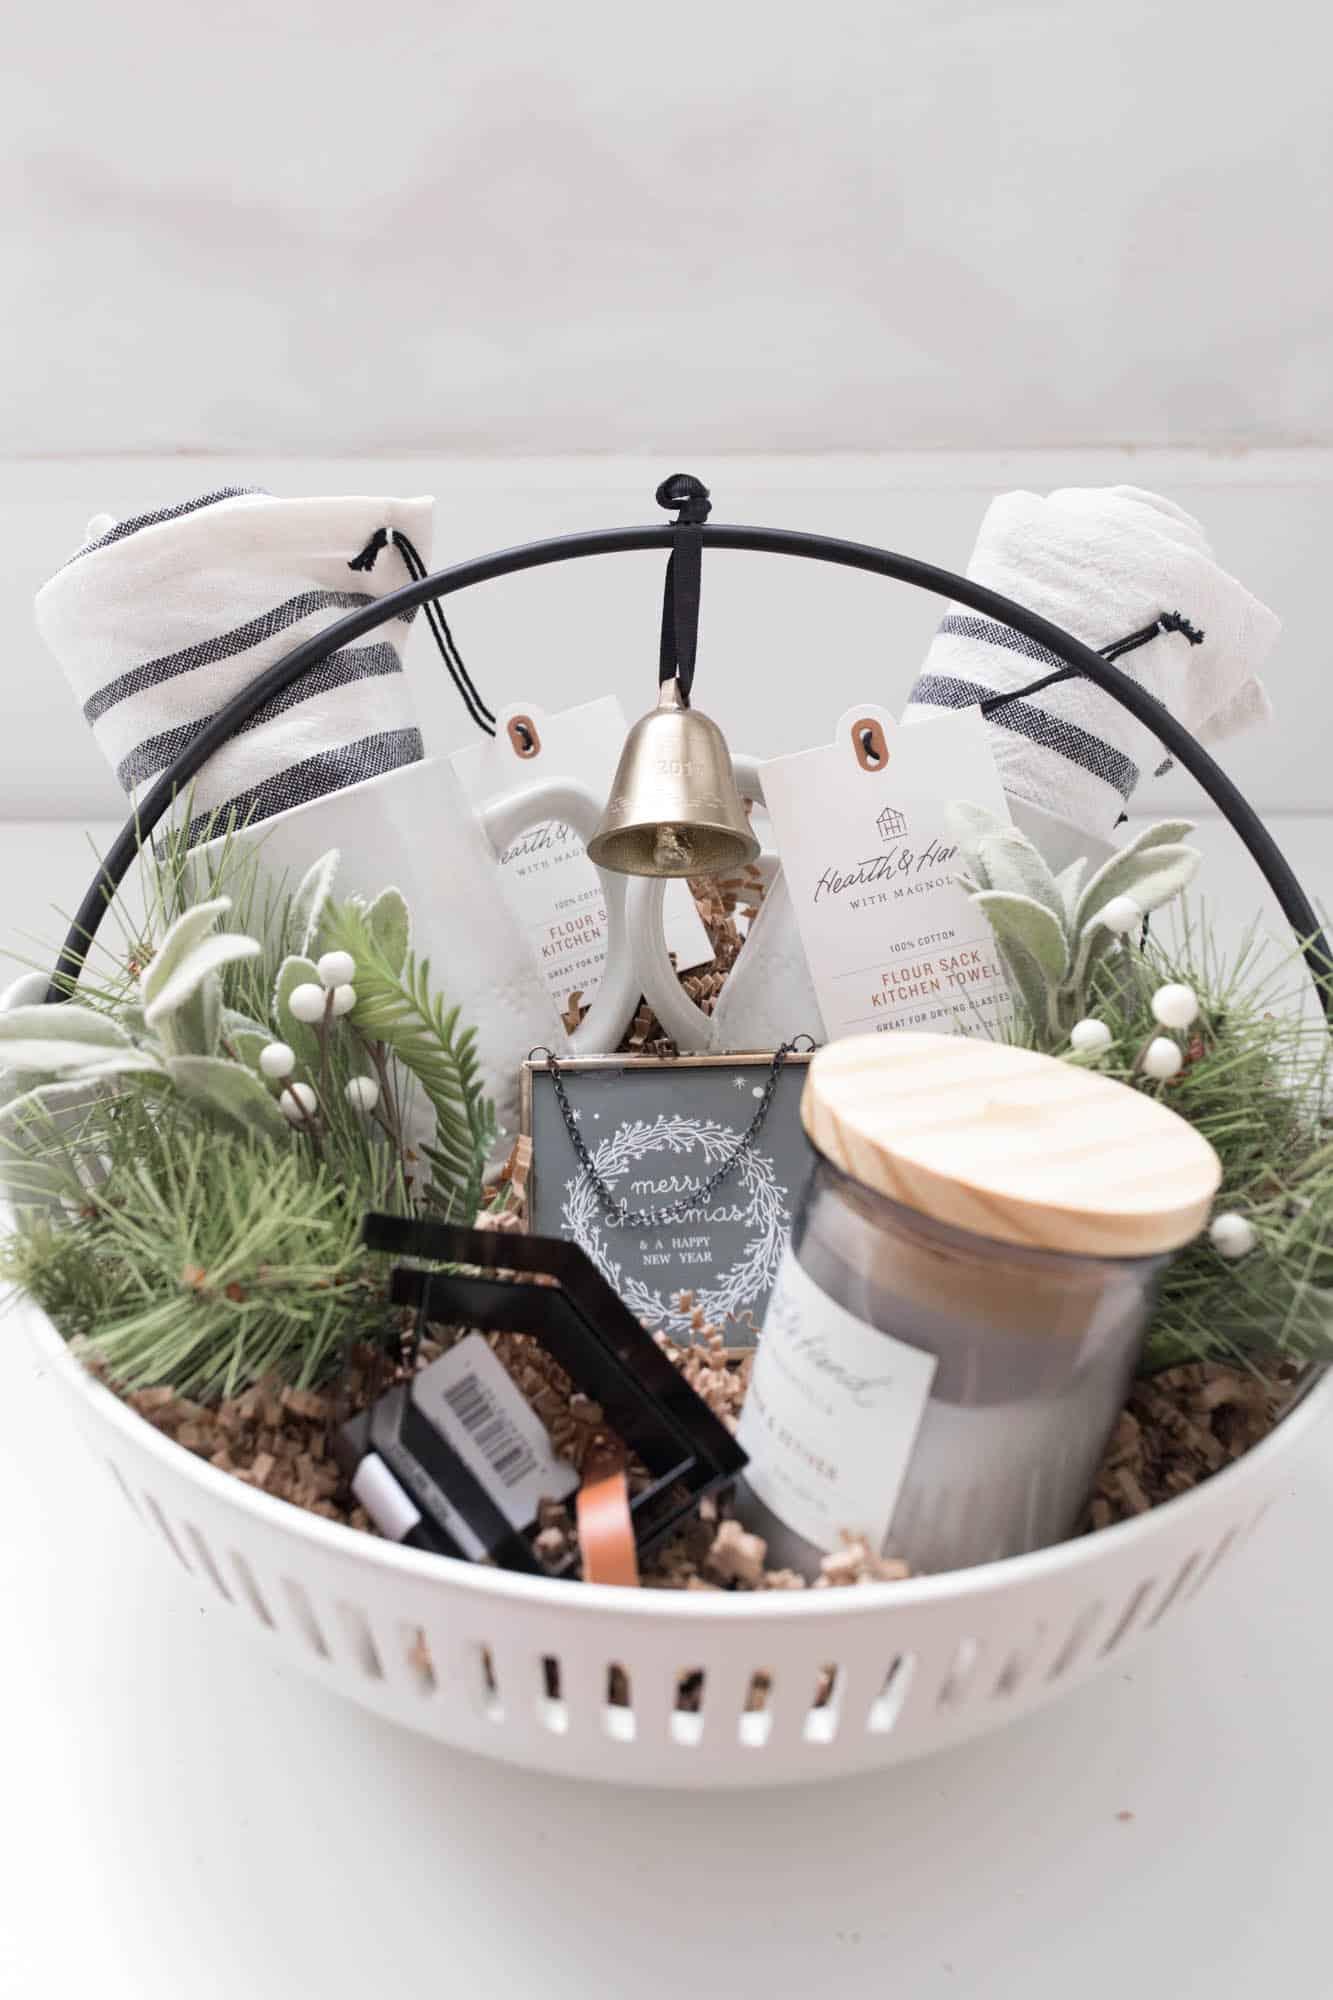 Hearth and Hand Christmas Gift Basket Idea for the Farmhouse Decor Lover on Your List